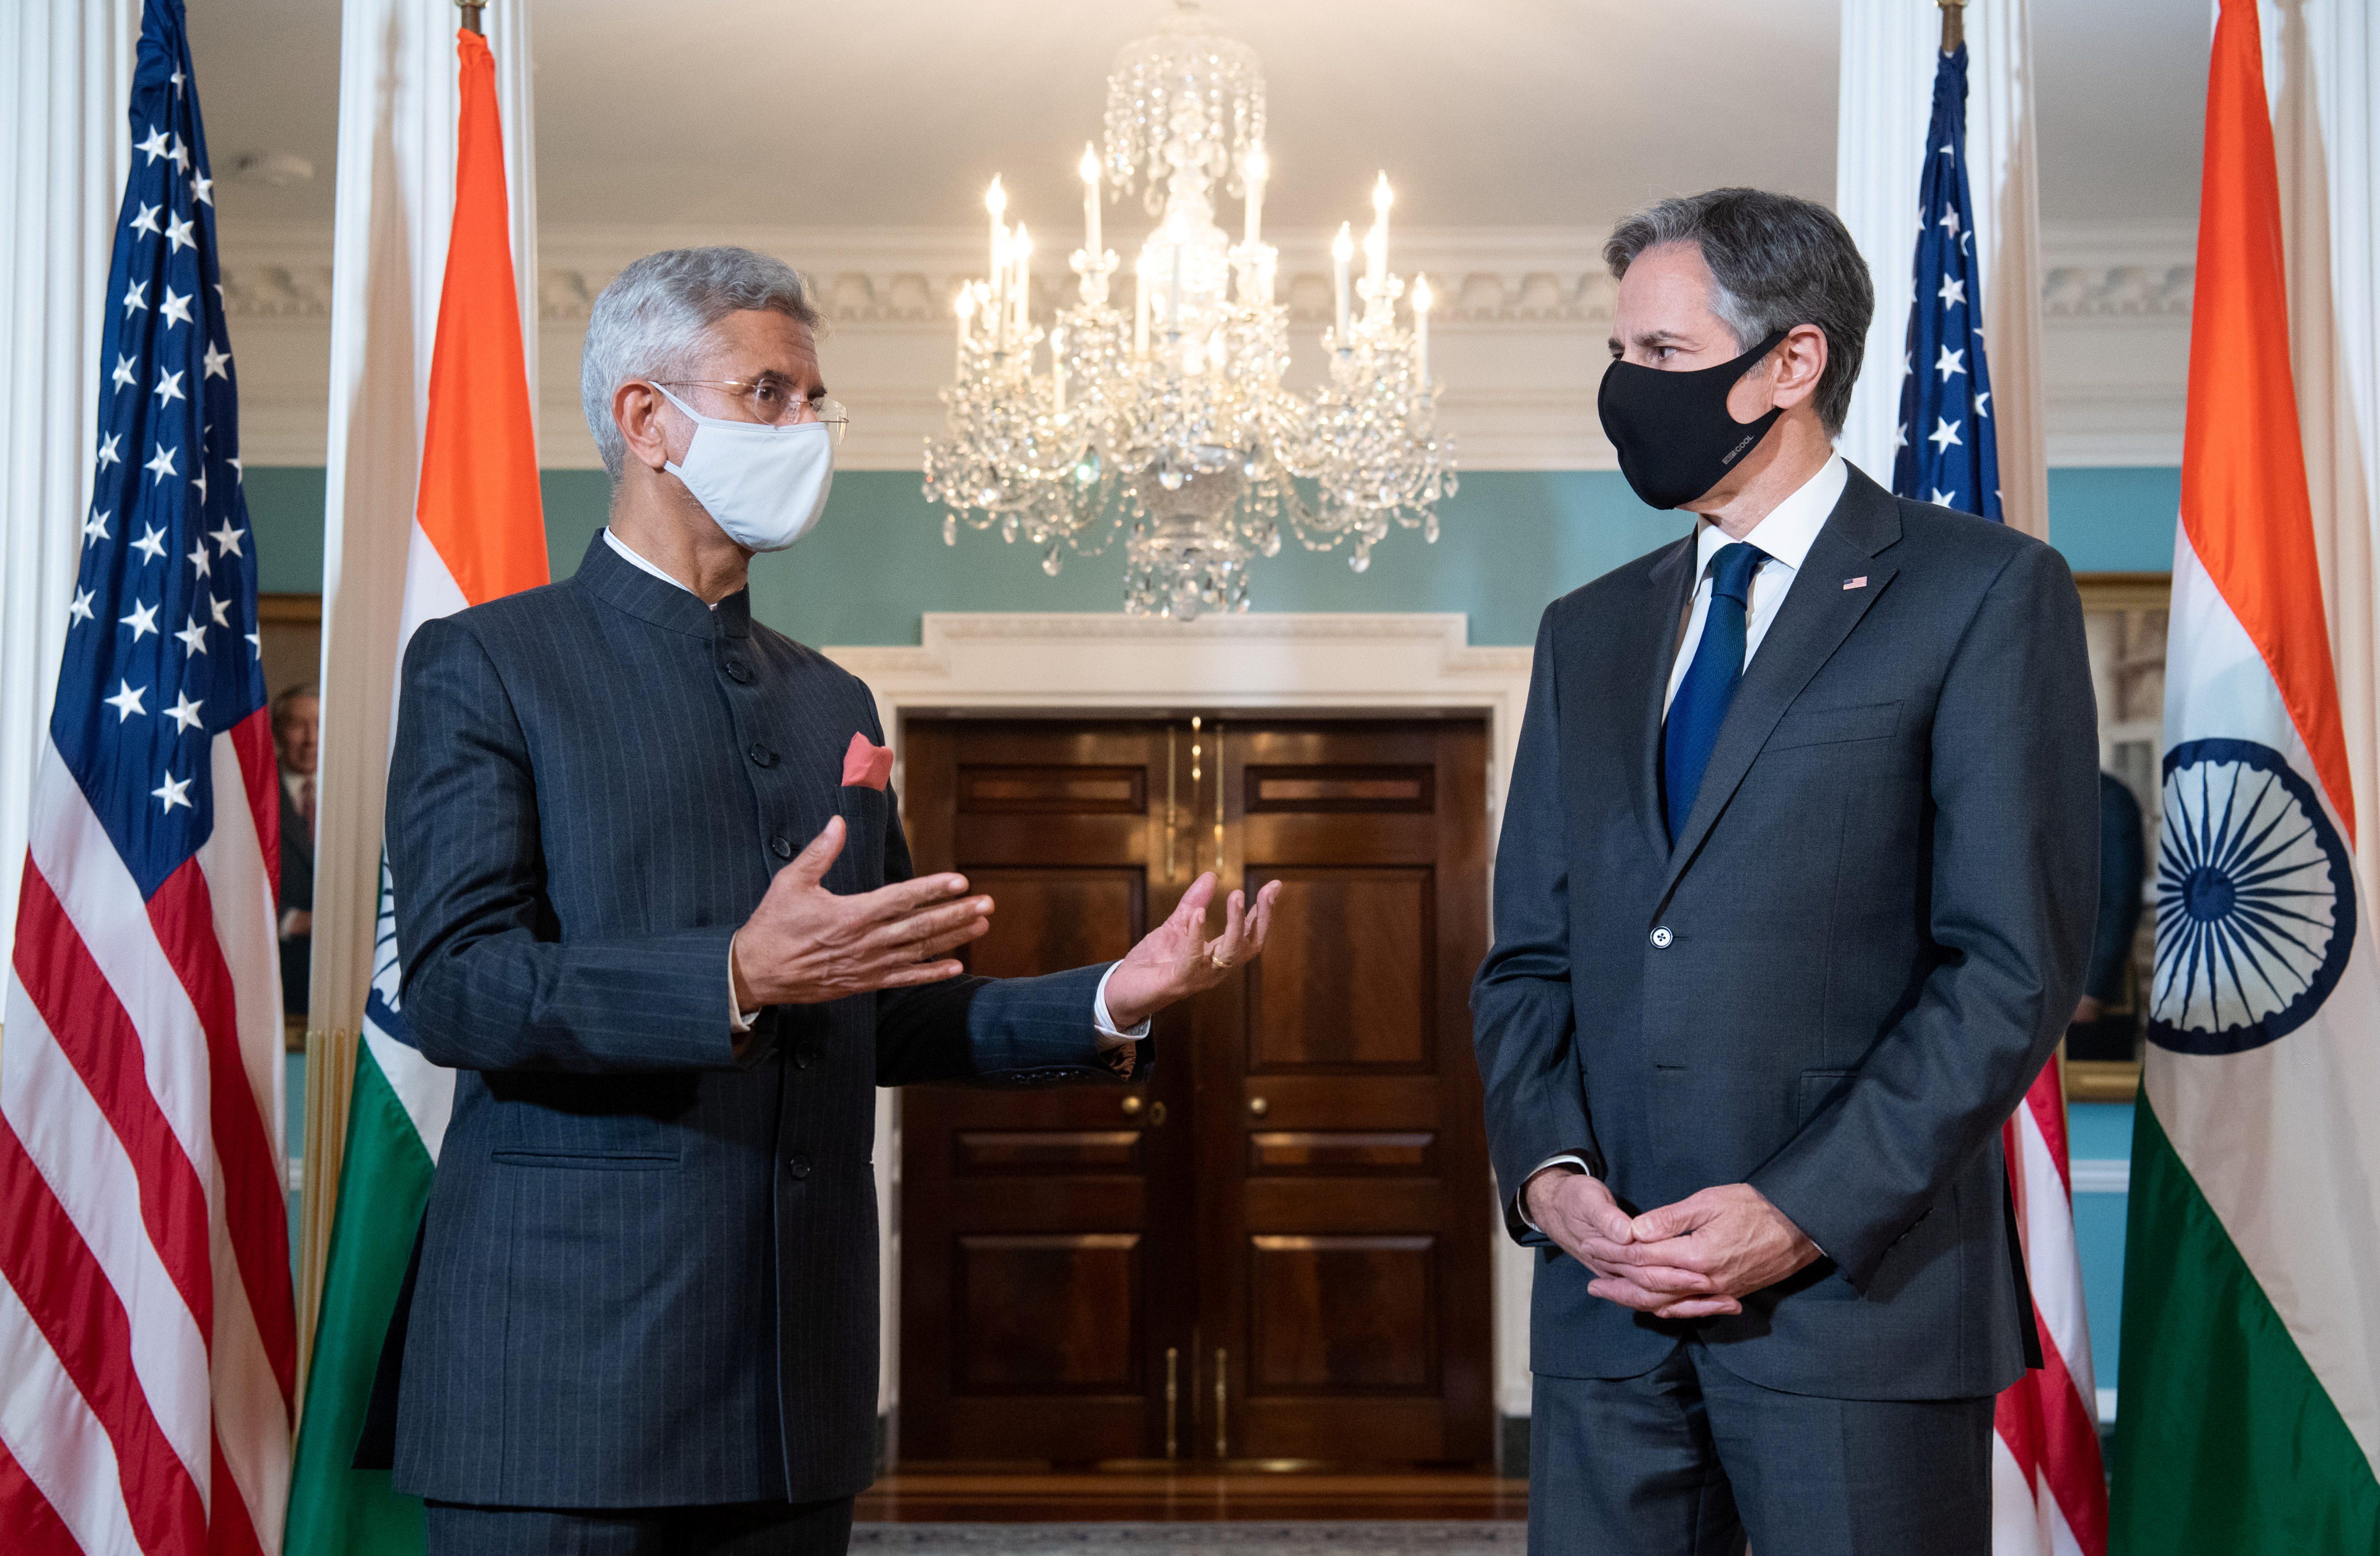 U.S. Secretary of State Blinken meets with India's External Affairs Minister Jaishankar